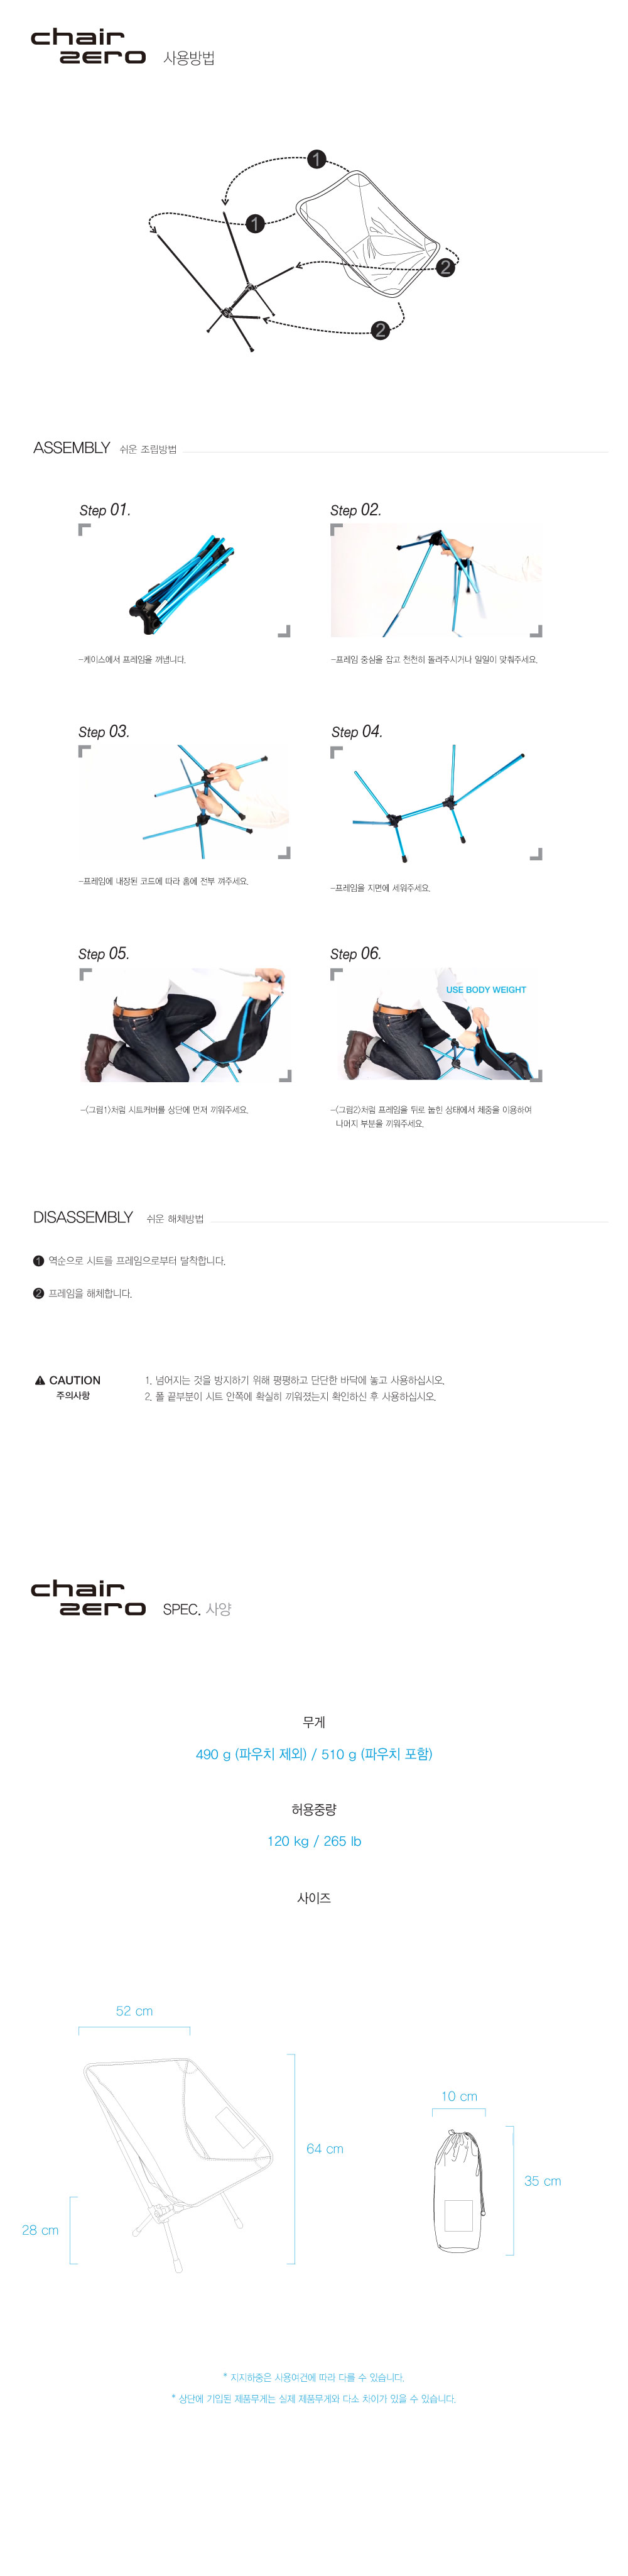 20180116-Chair-Zero-grey-상품페이지3.jpg